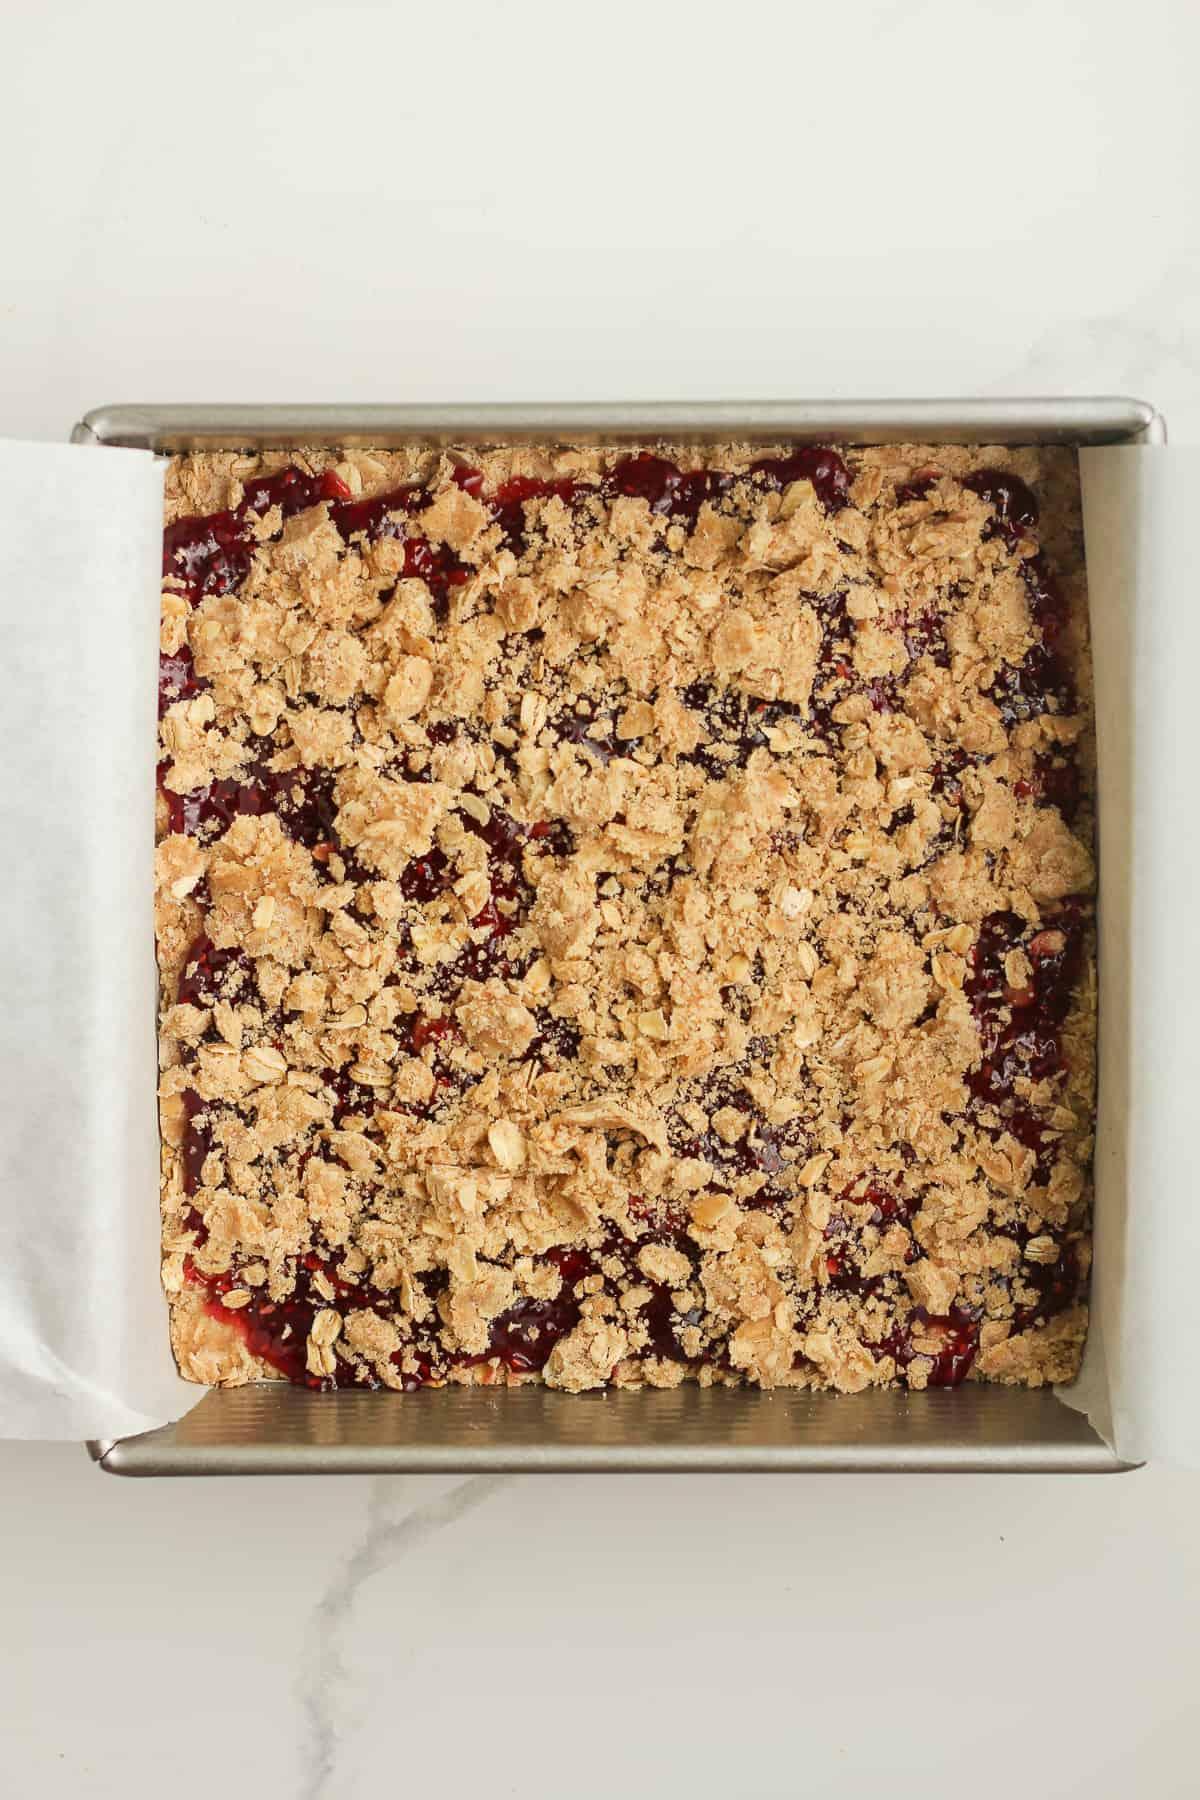 An 8x8 pan of raspberry jam bars before baking.